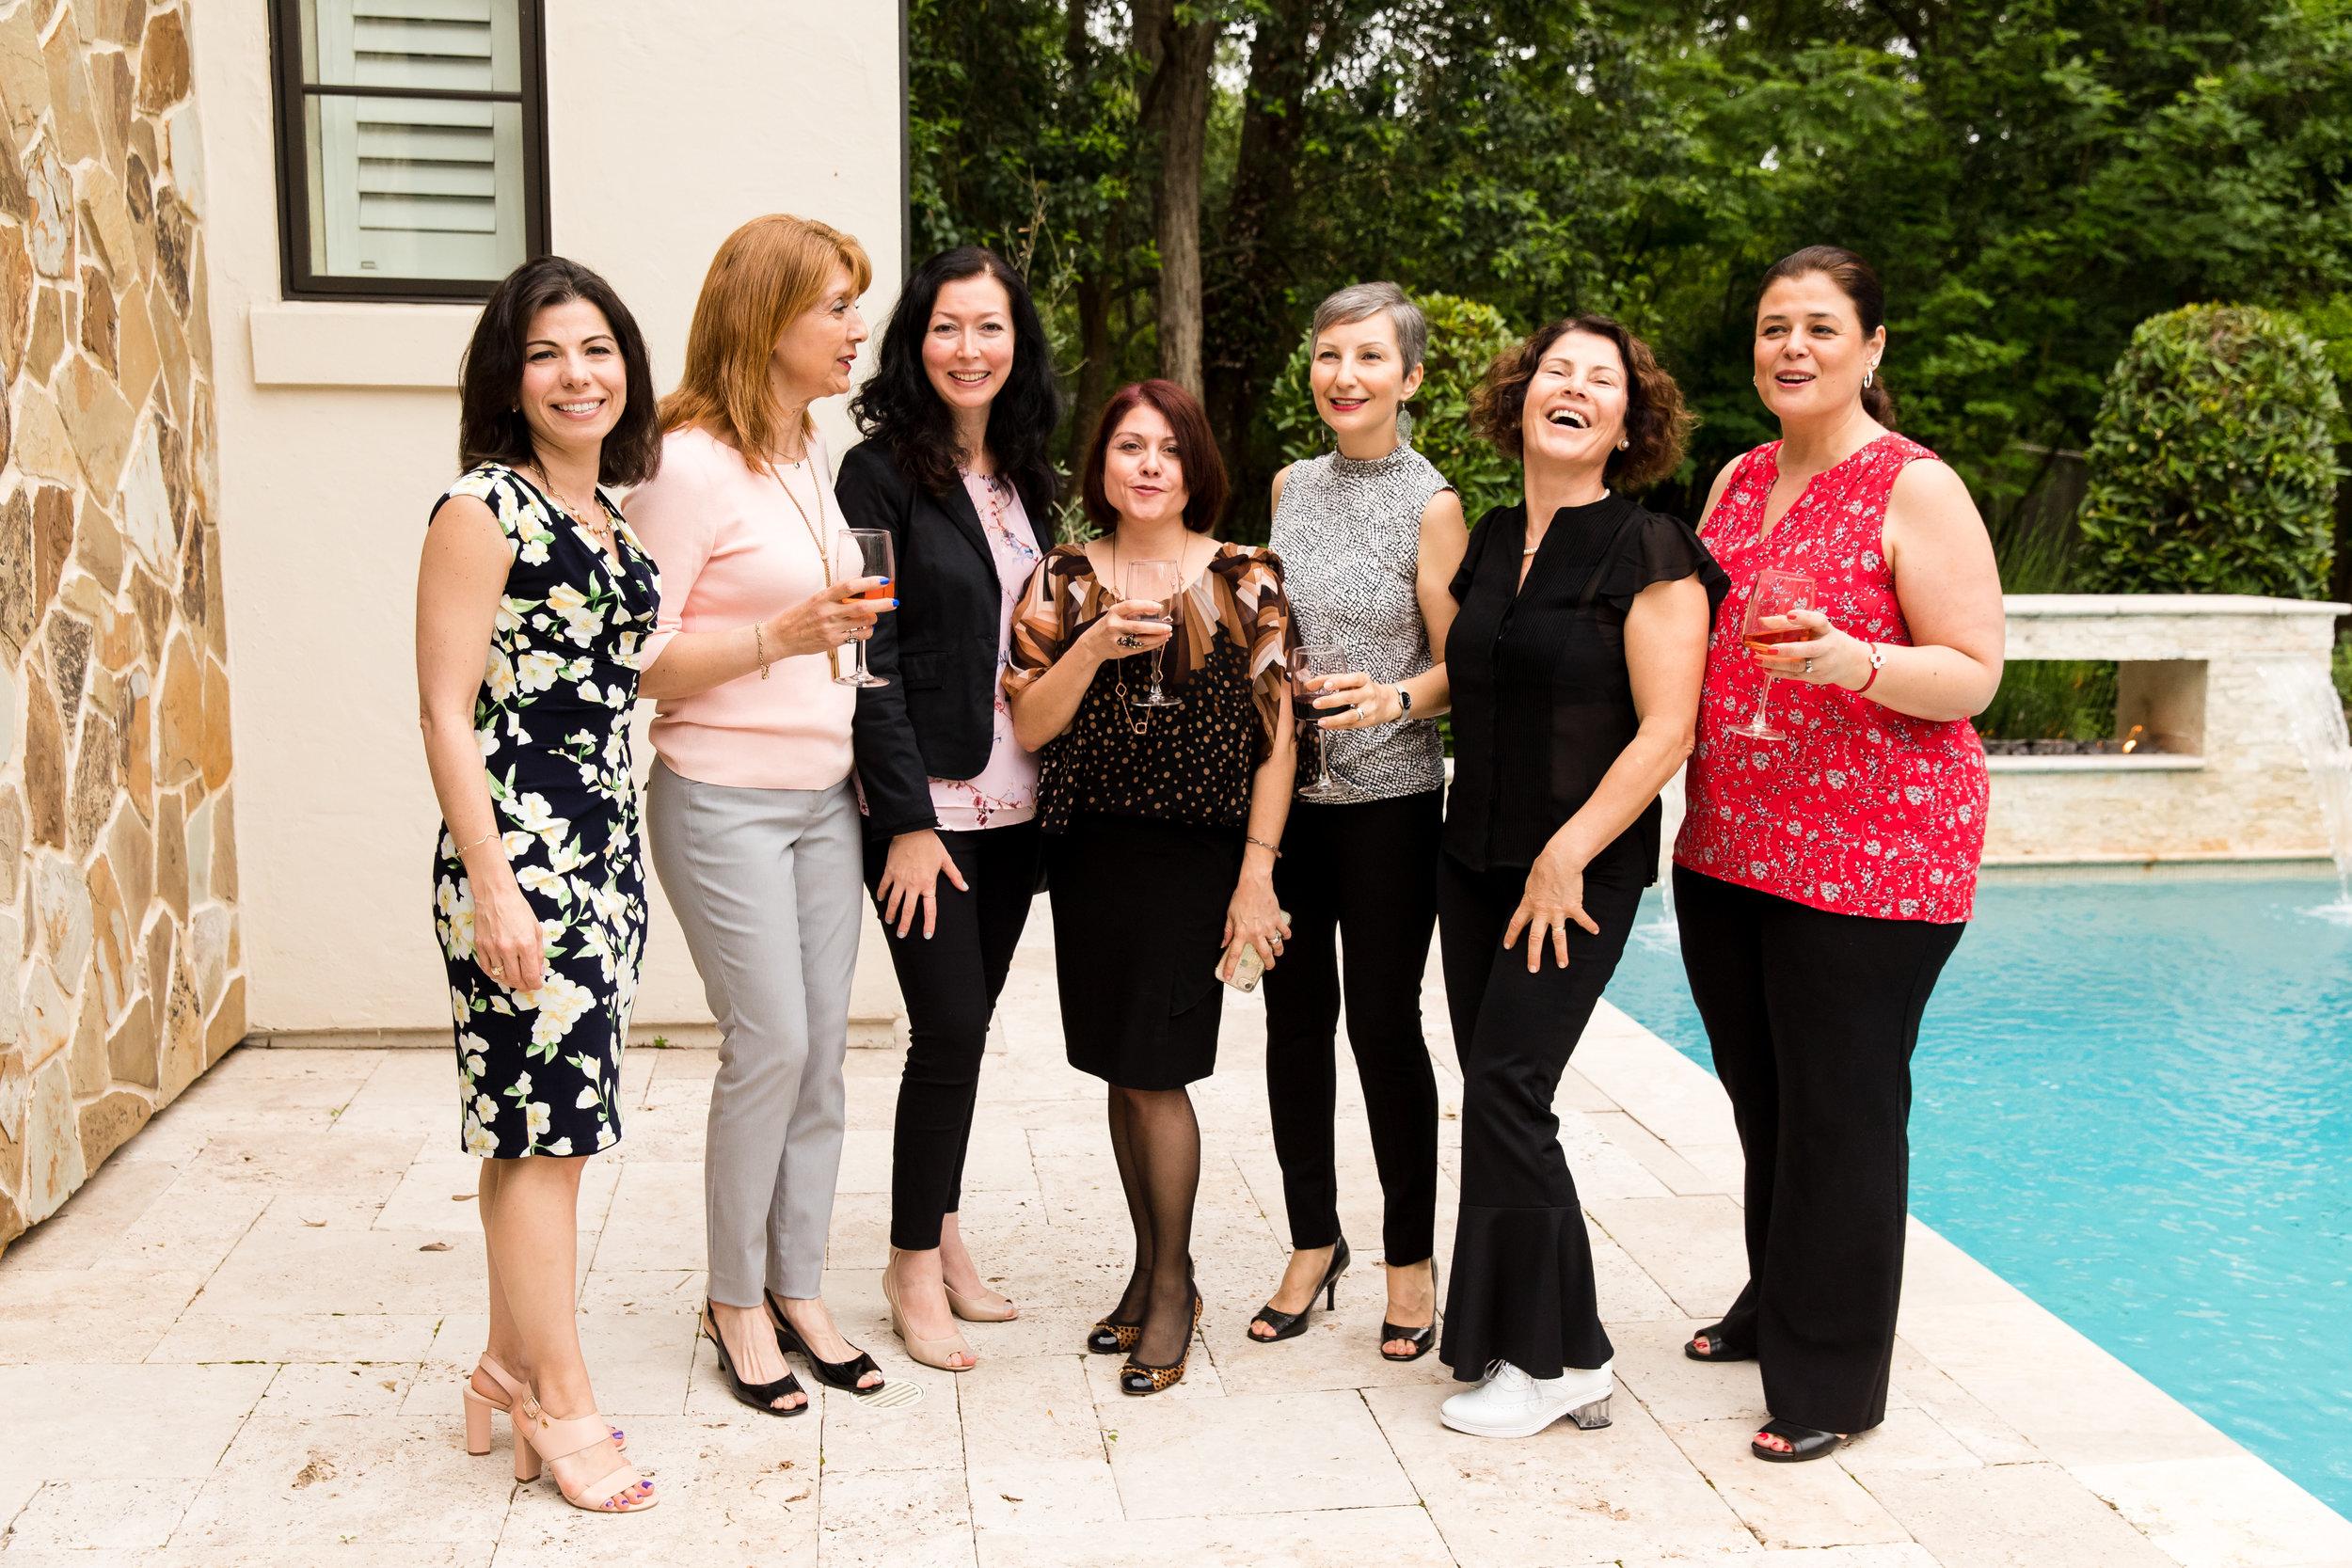 20180421-3rd Annual Education Women Turkey-172.jpg